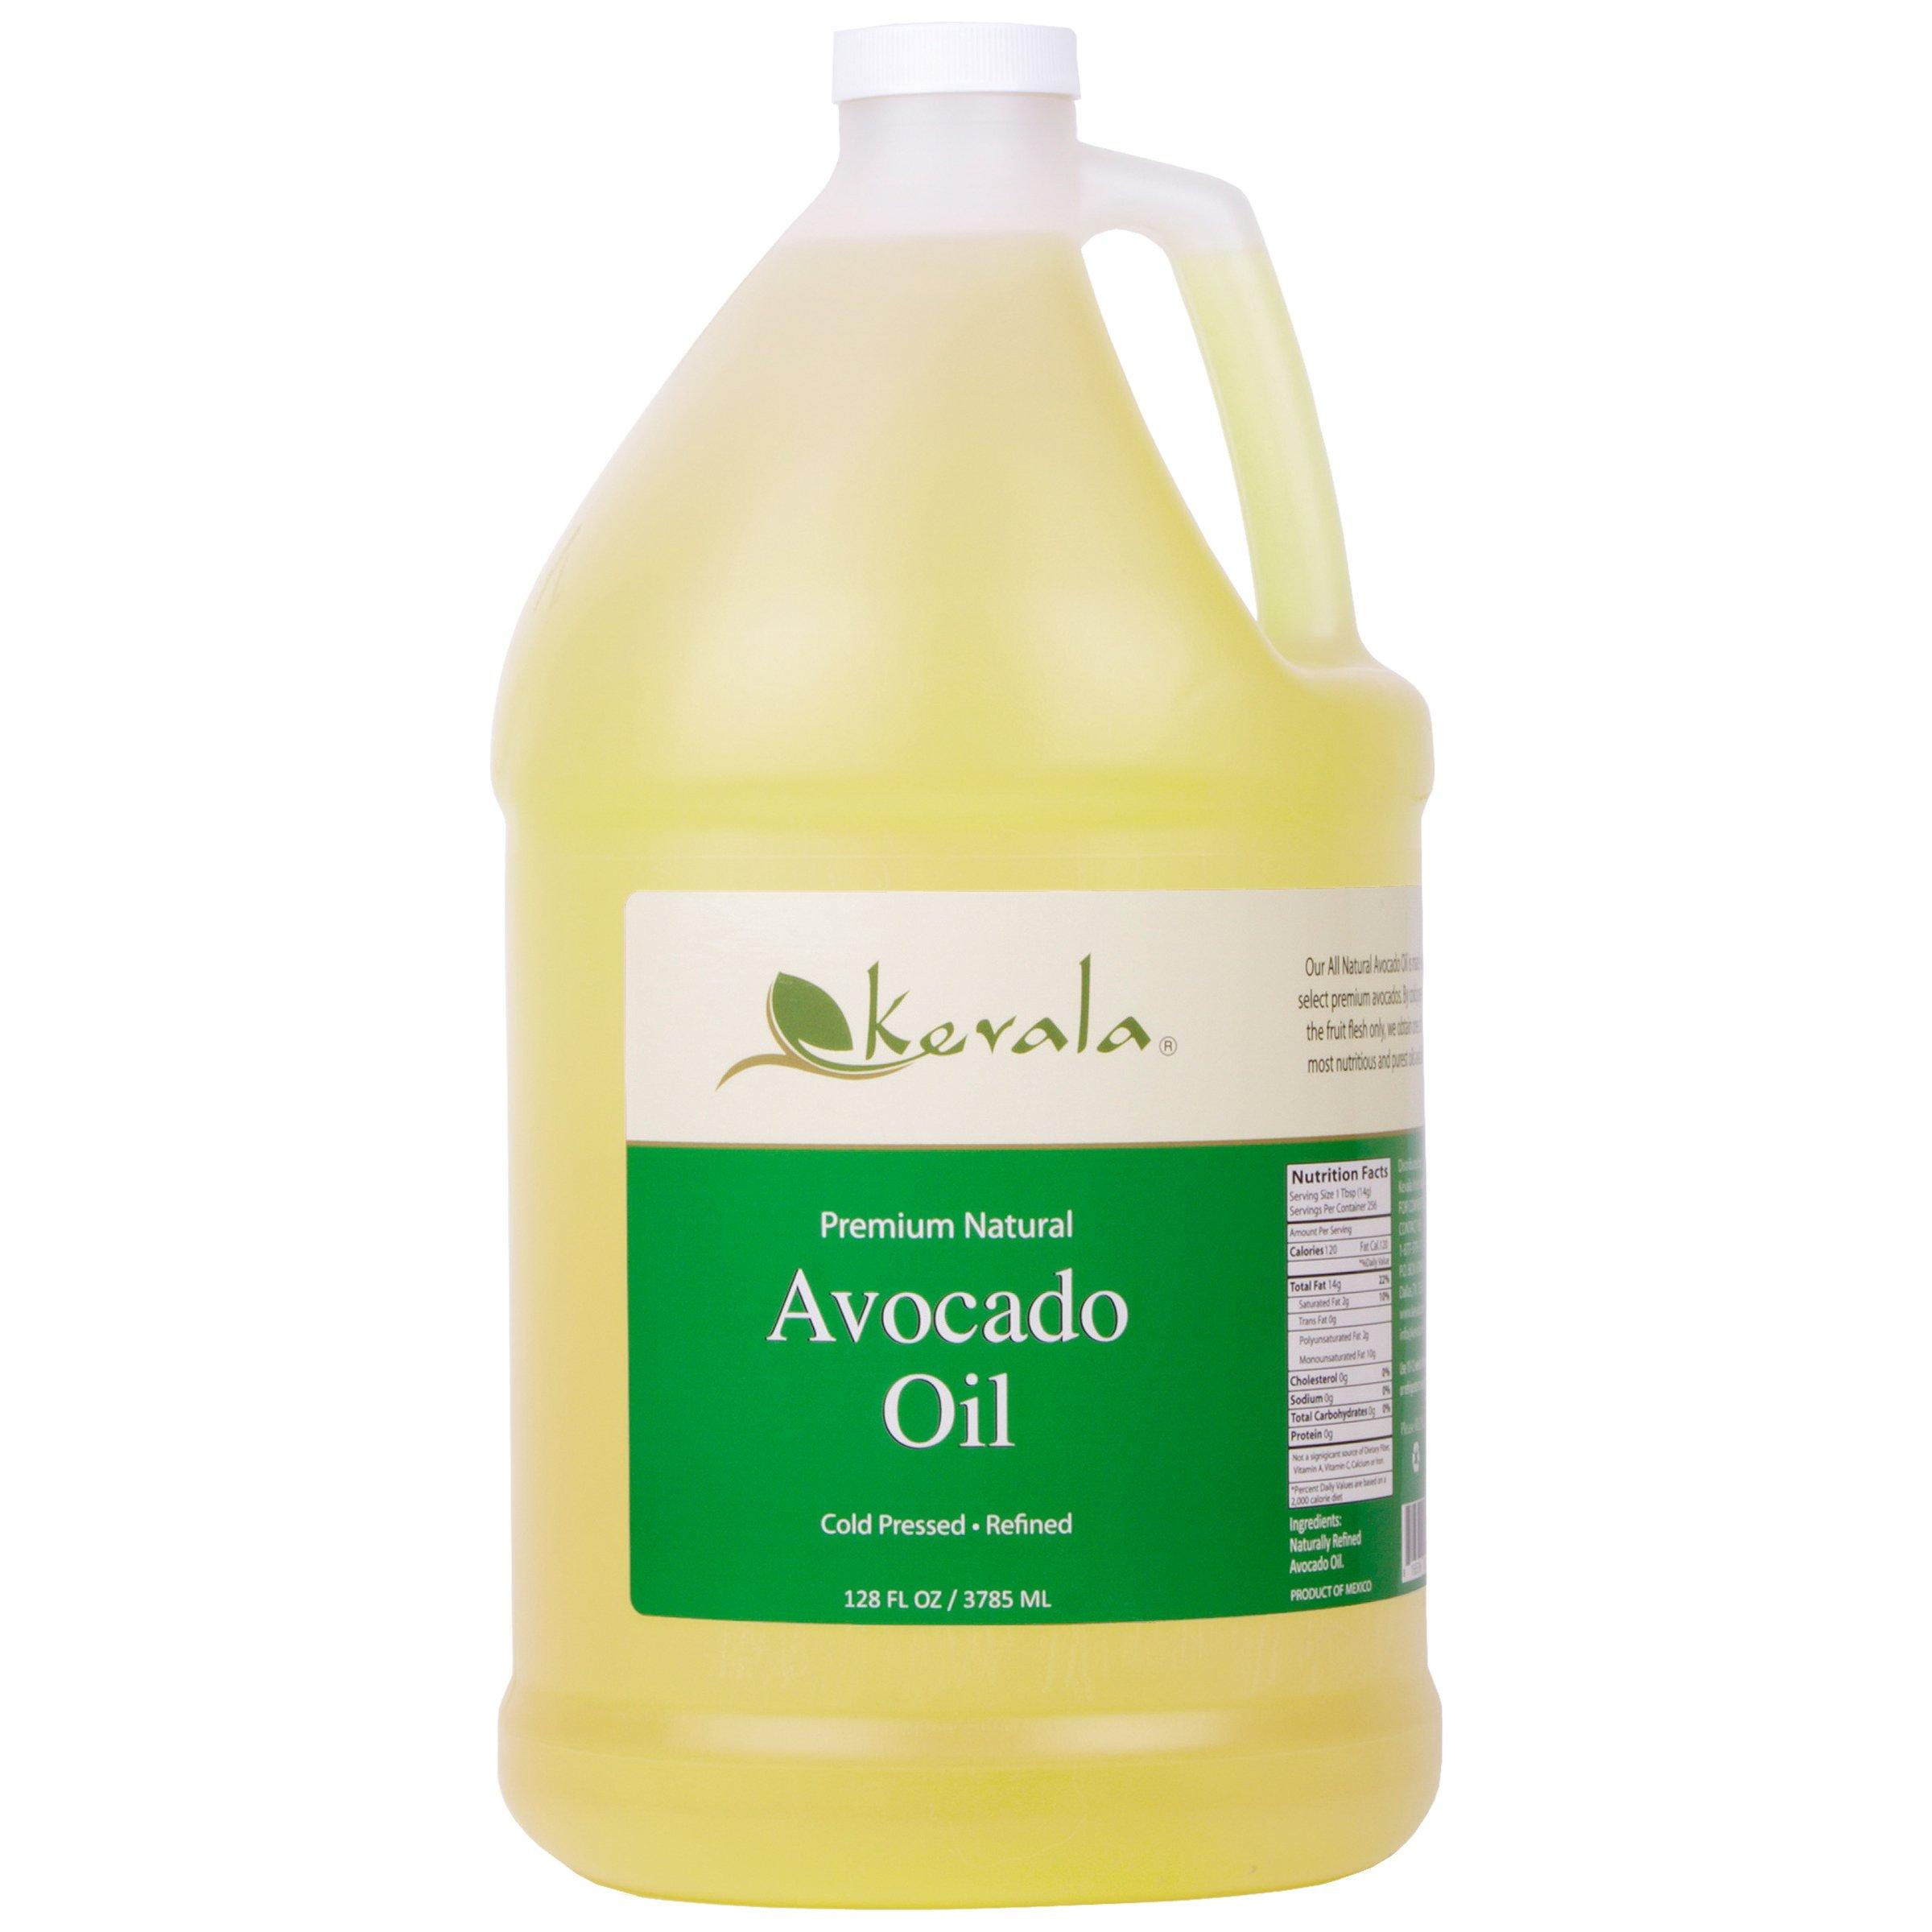 Kevala Avocado Oil 1 Gallon (Refined)